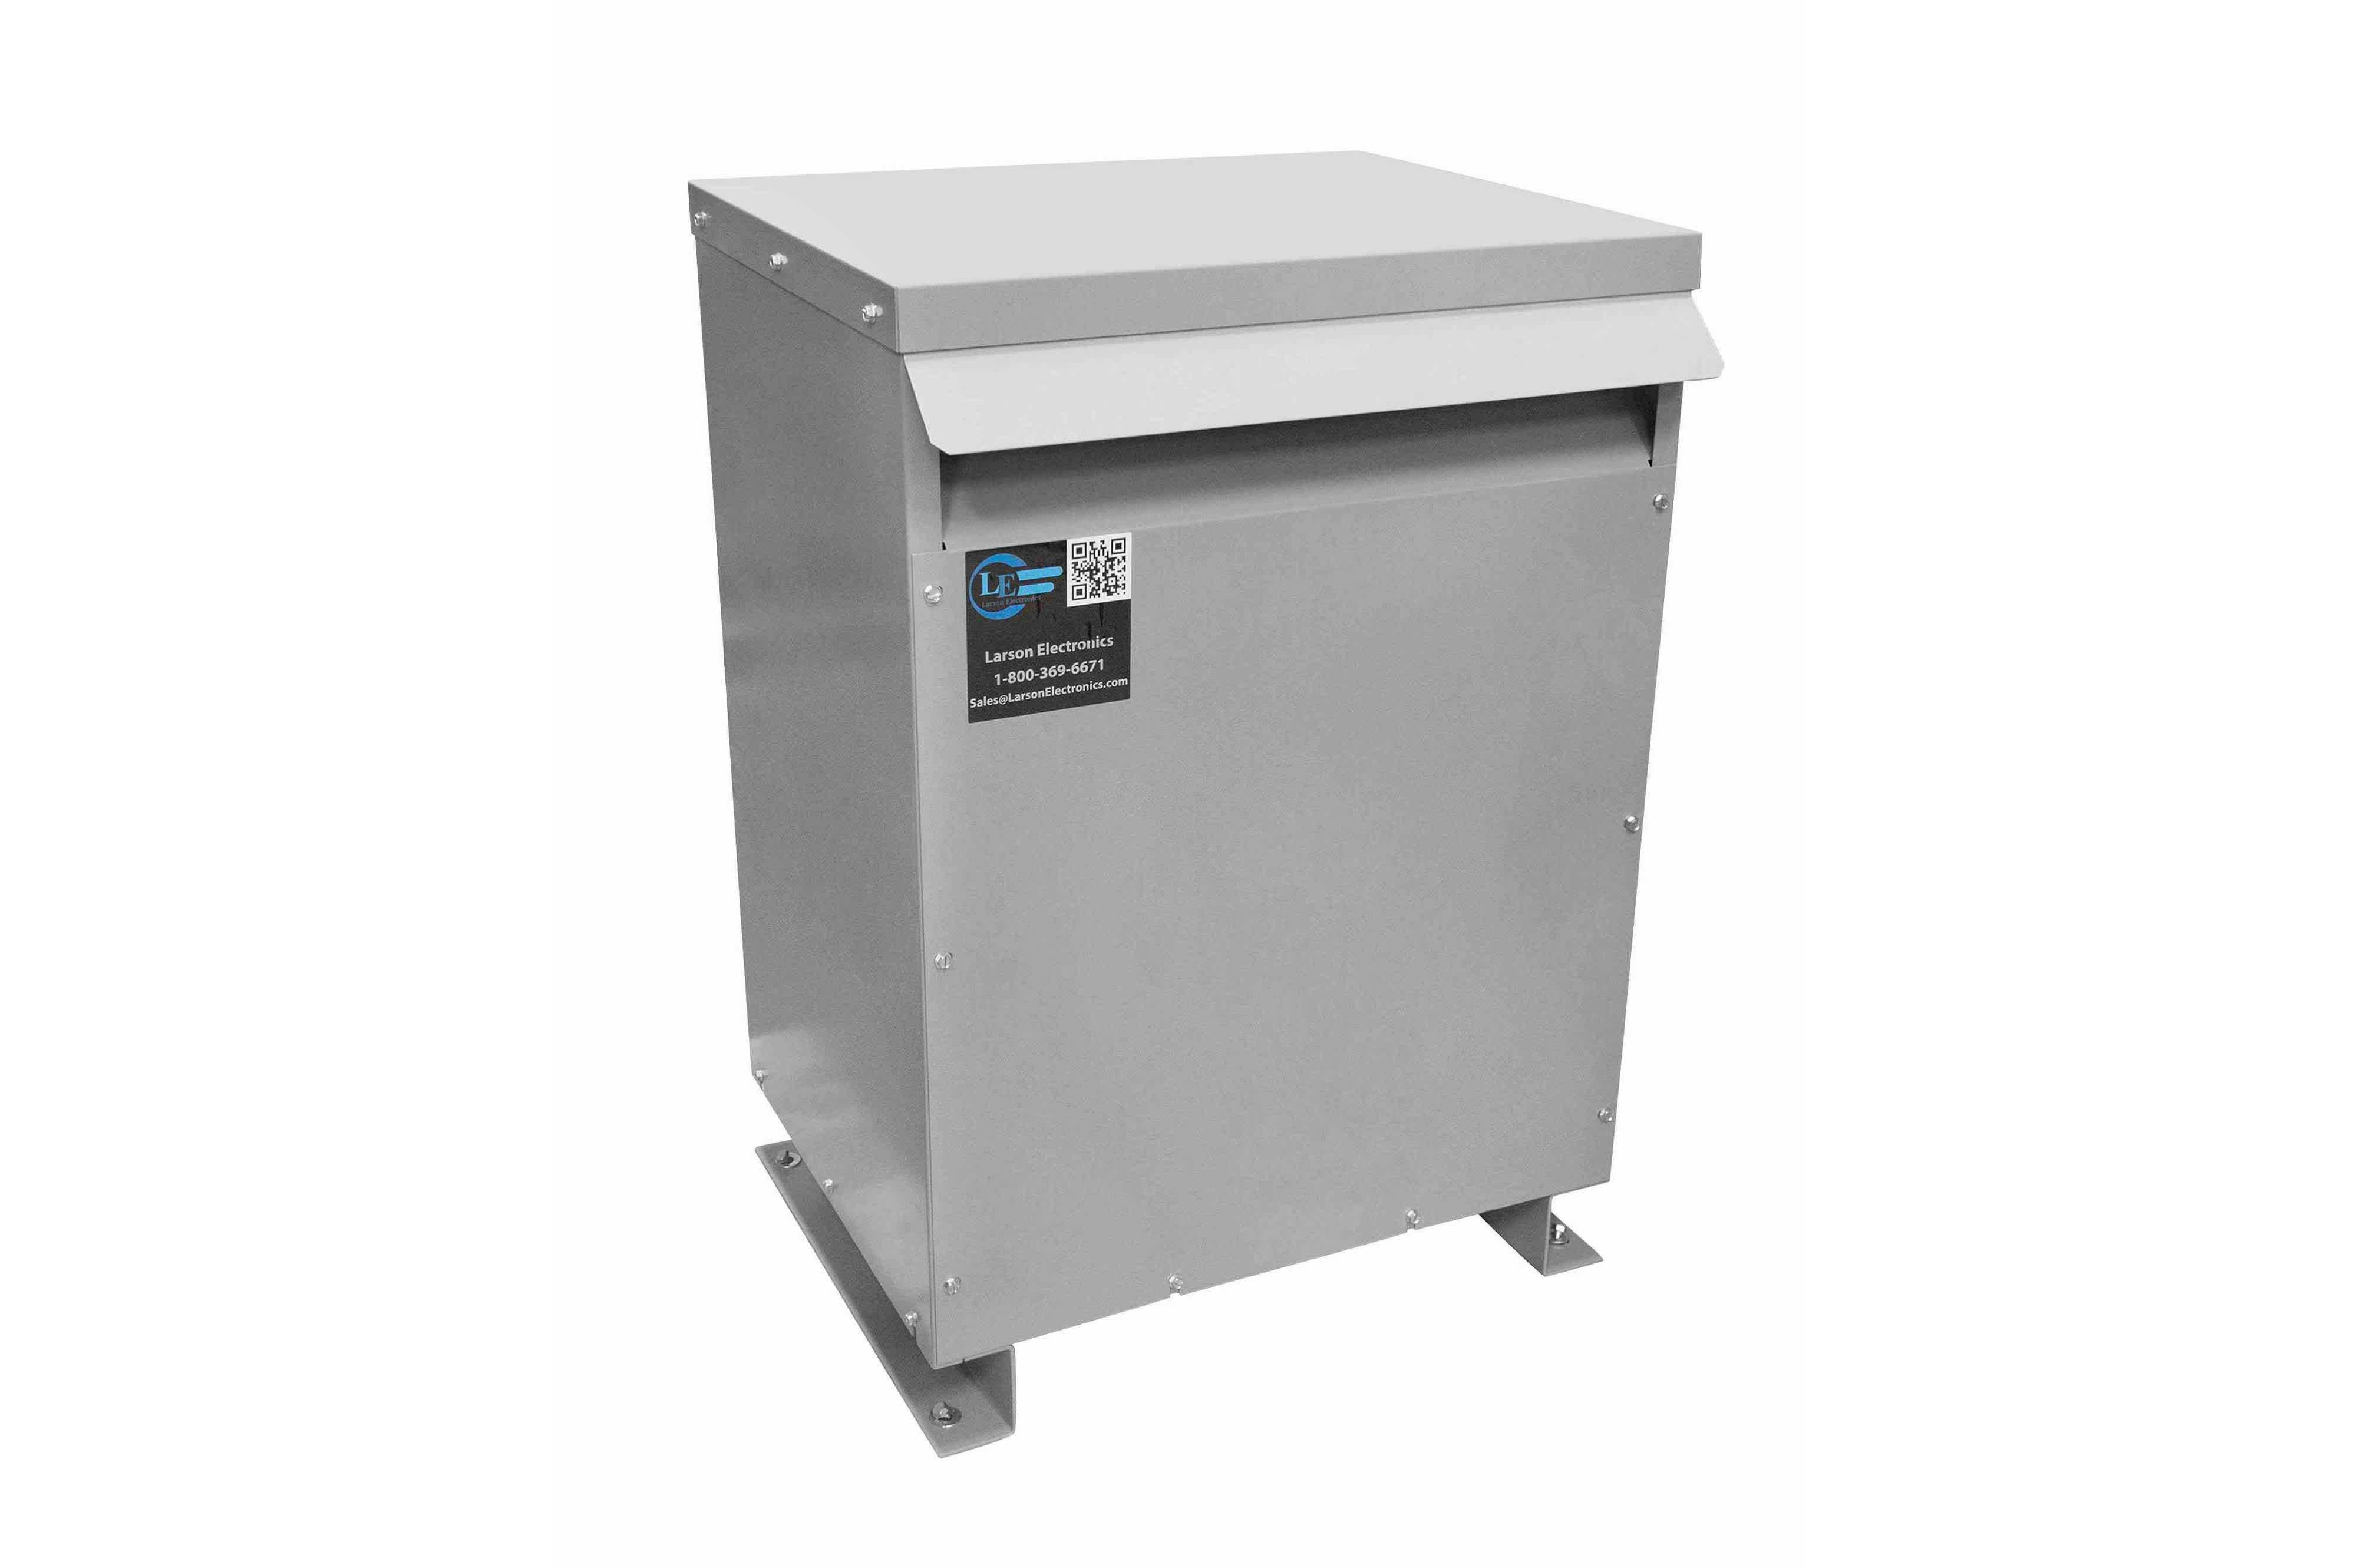 14 kVA 3PH Isolation Transformer, 240V Wye Primary, 415V Delta Secondary, N3R, Ventilated, 60 Hz